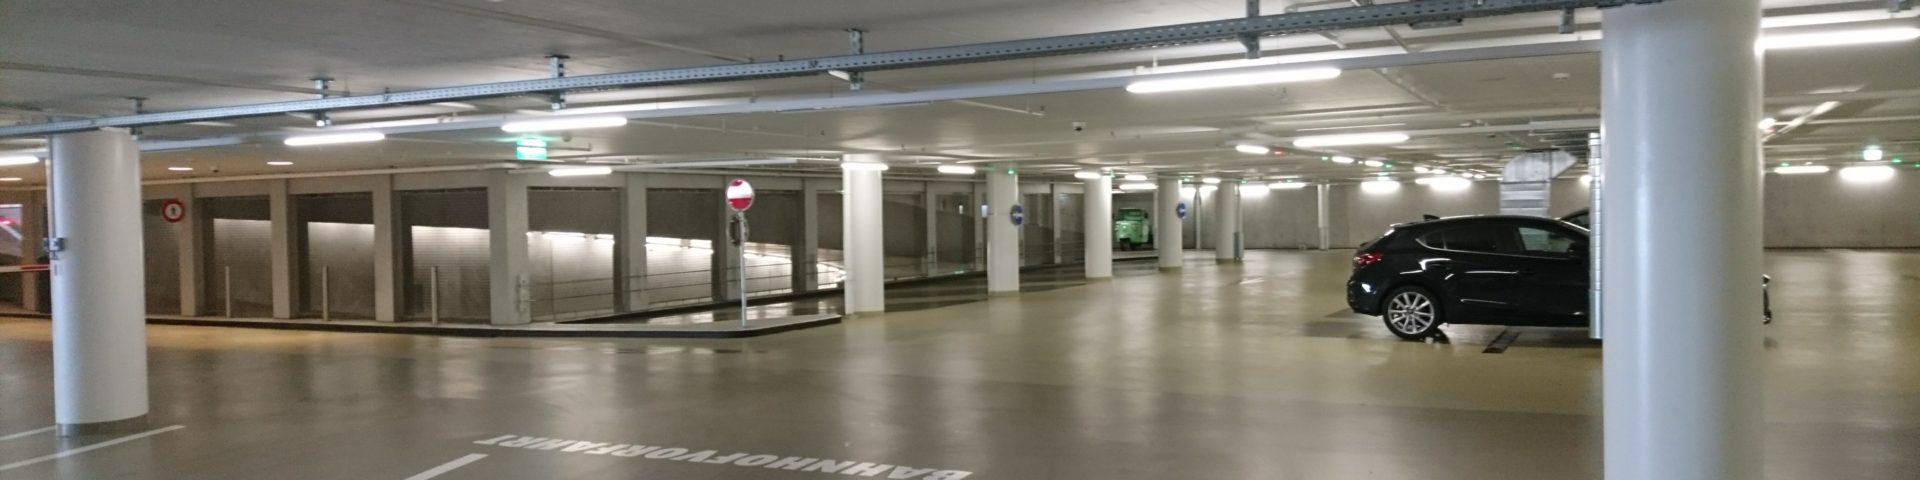 Parkgarage FHSG